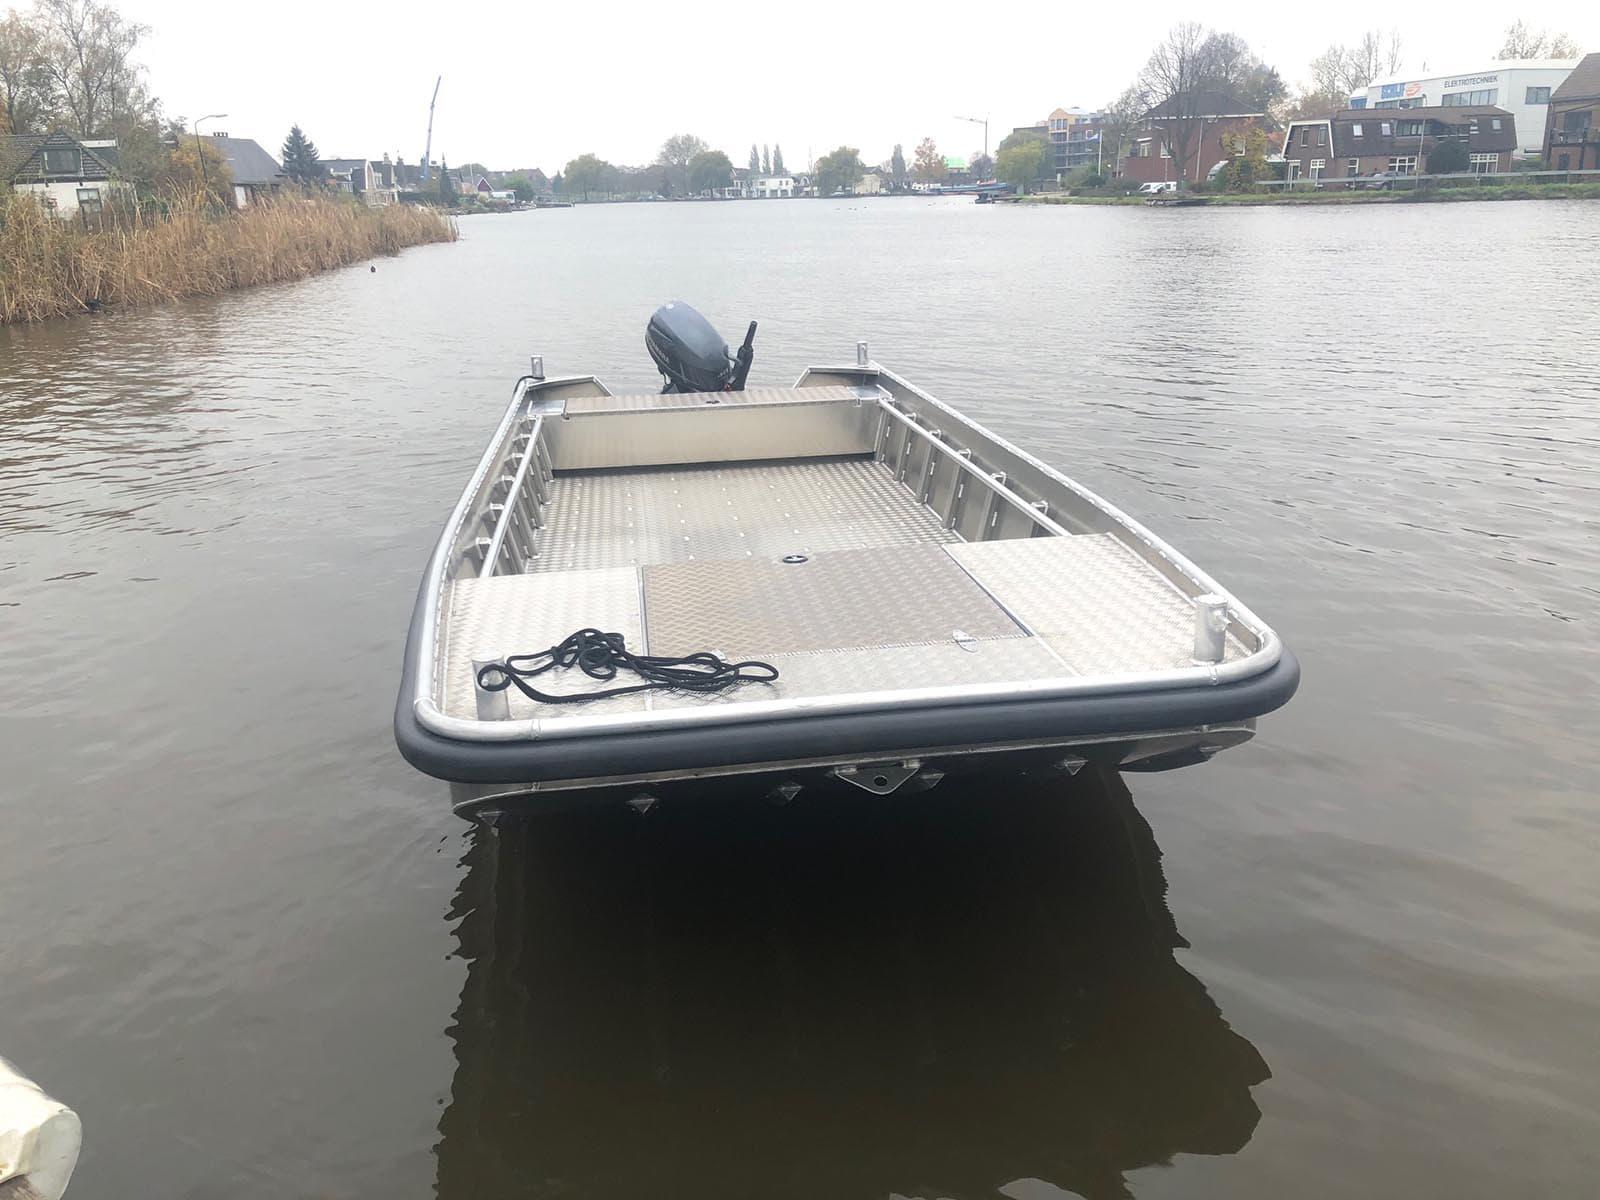 AluminiumJon.nl - AuminiumJon - Jon 624 Pro - 011 - Nieuw model 2020